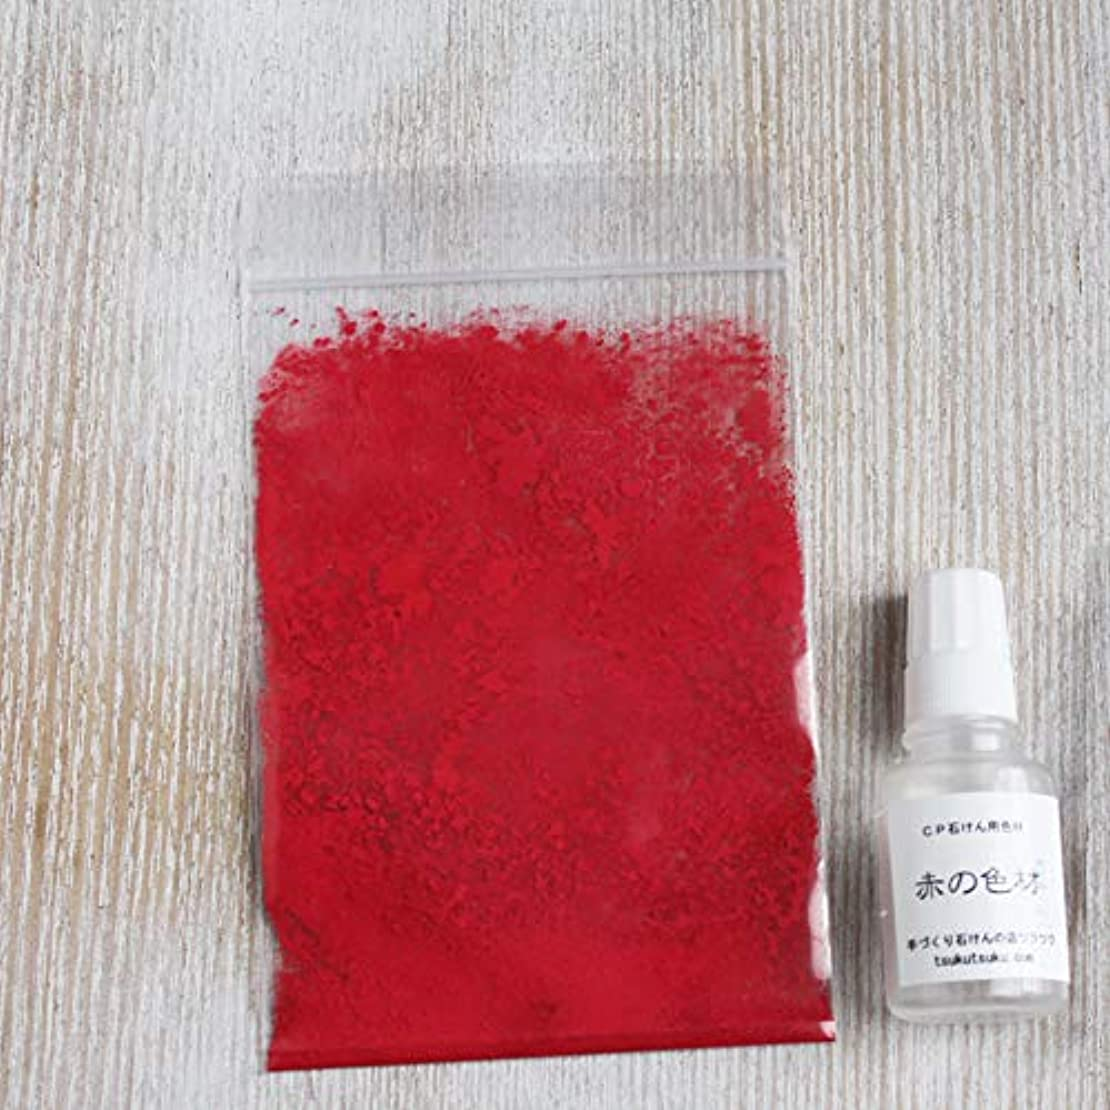 CP石けん用色材 赤の色材キット/手作り石けん?手作り化粧品材料